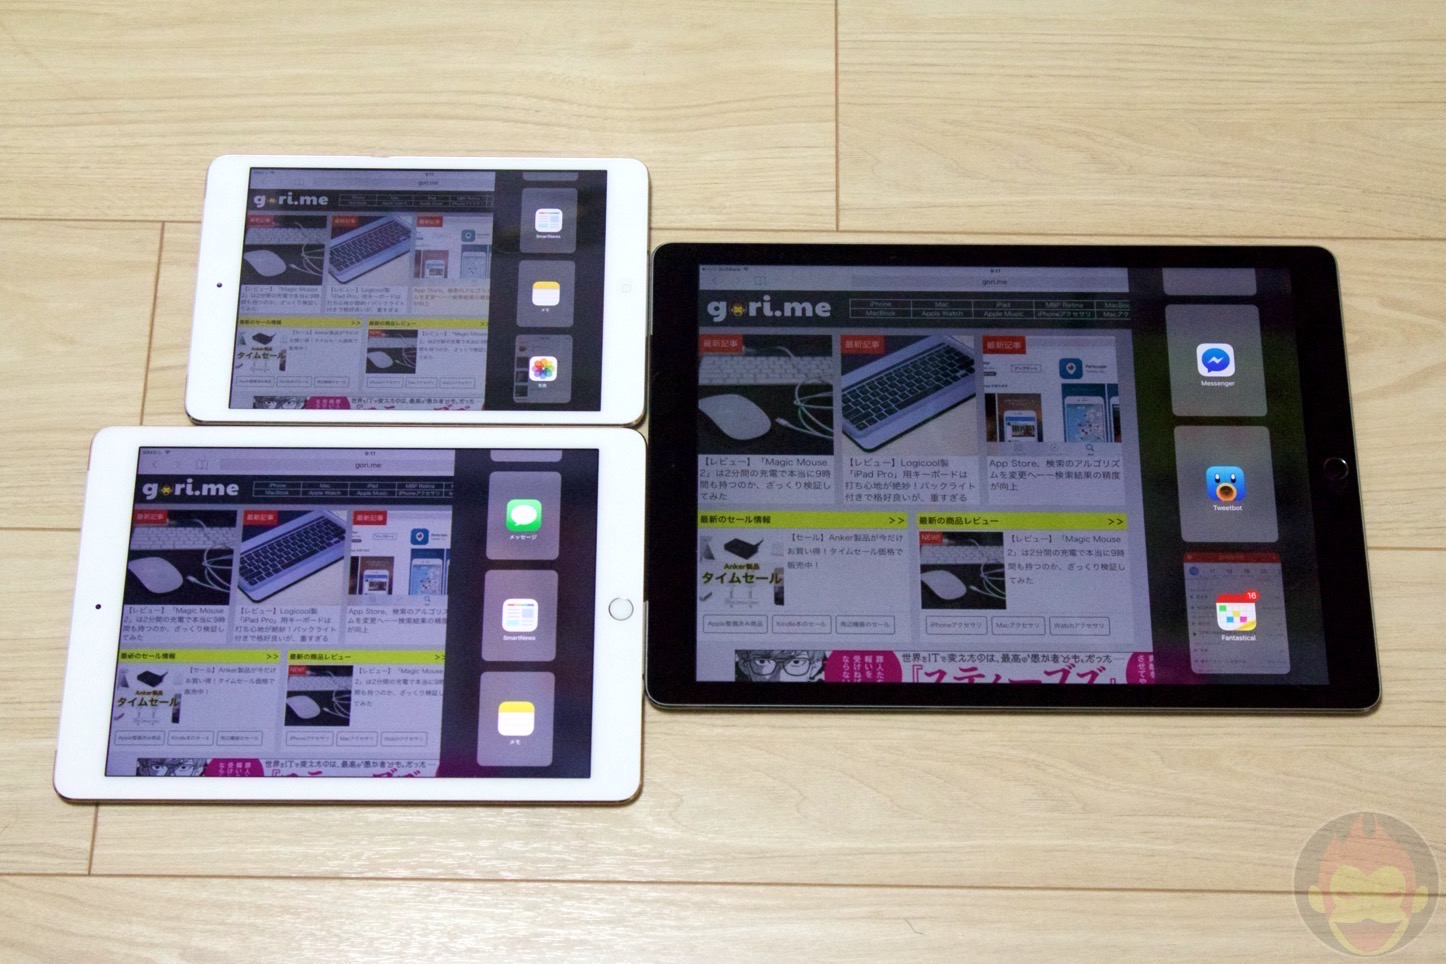 iPad-Pro-Air2-mini2-Comparison-09.jpg